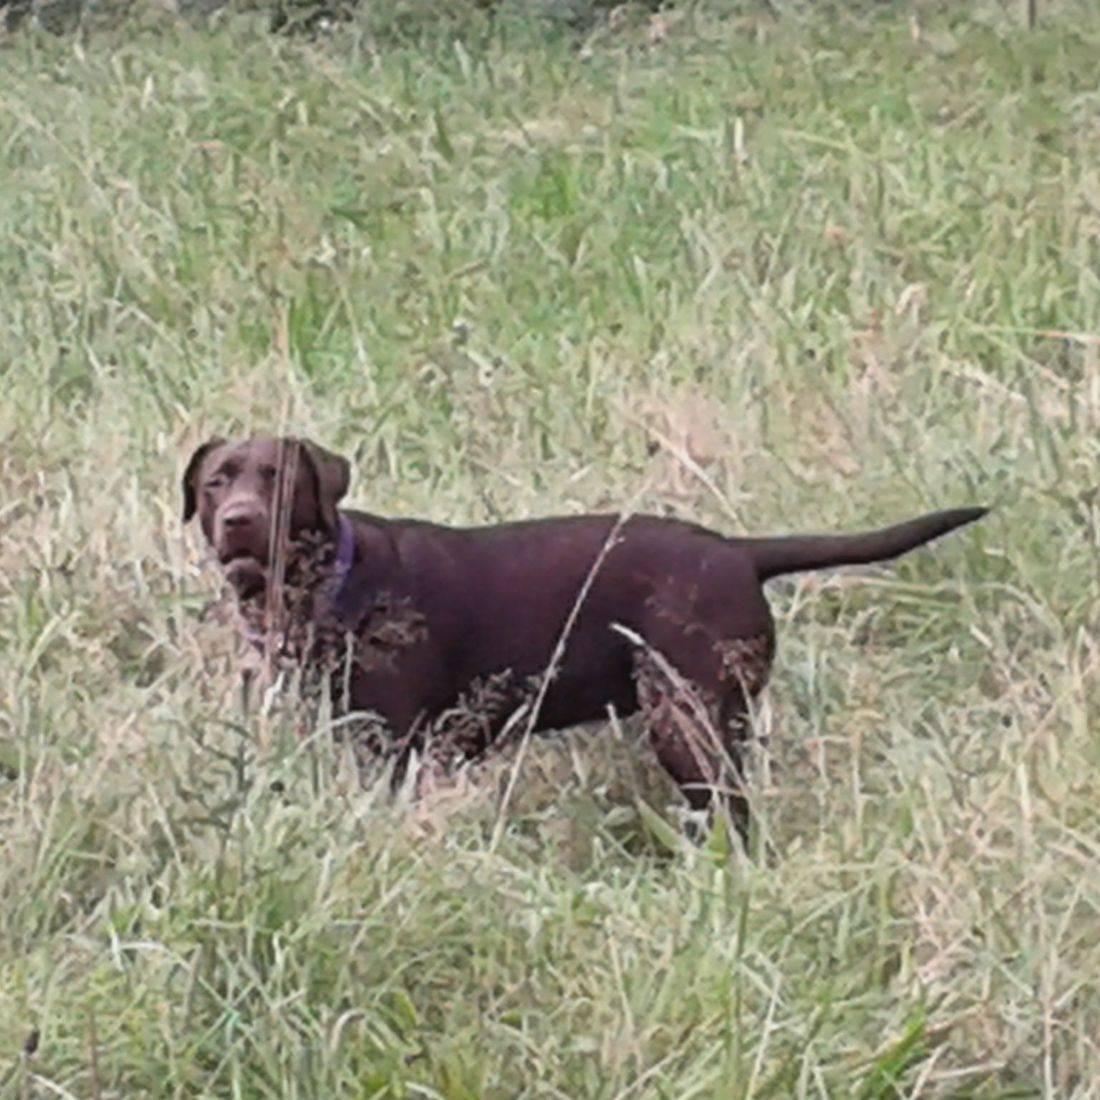 Chocolate labrador in field